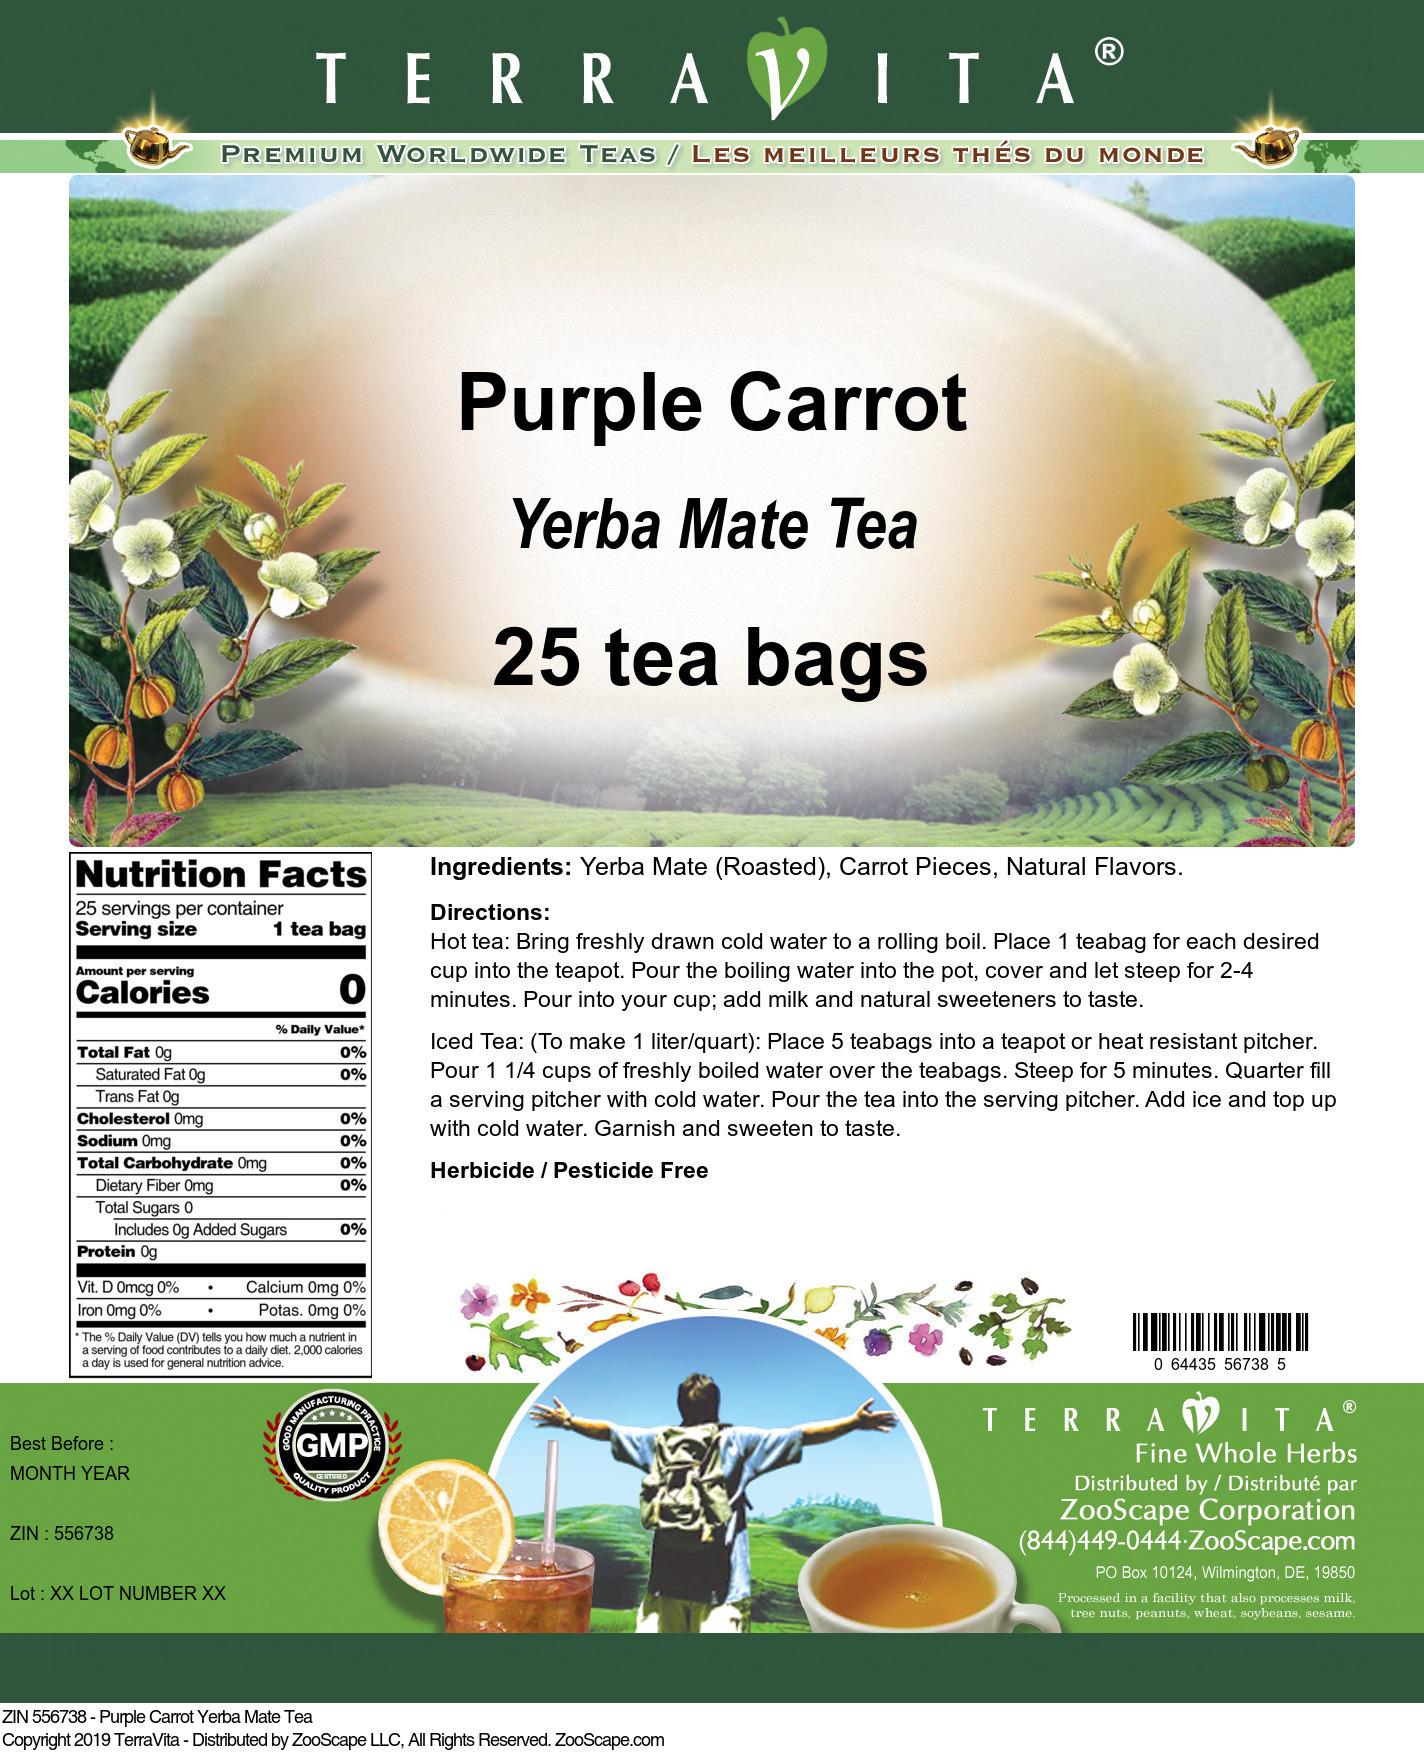 Purple Carrot Yerba Mate Tea